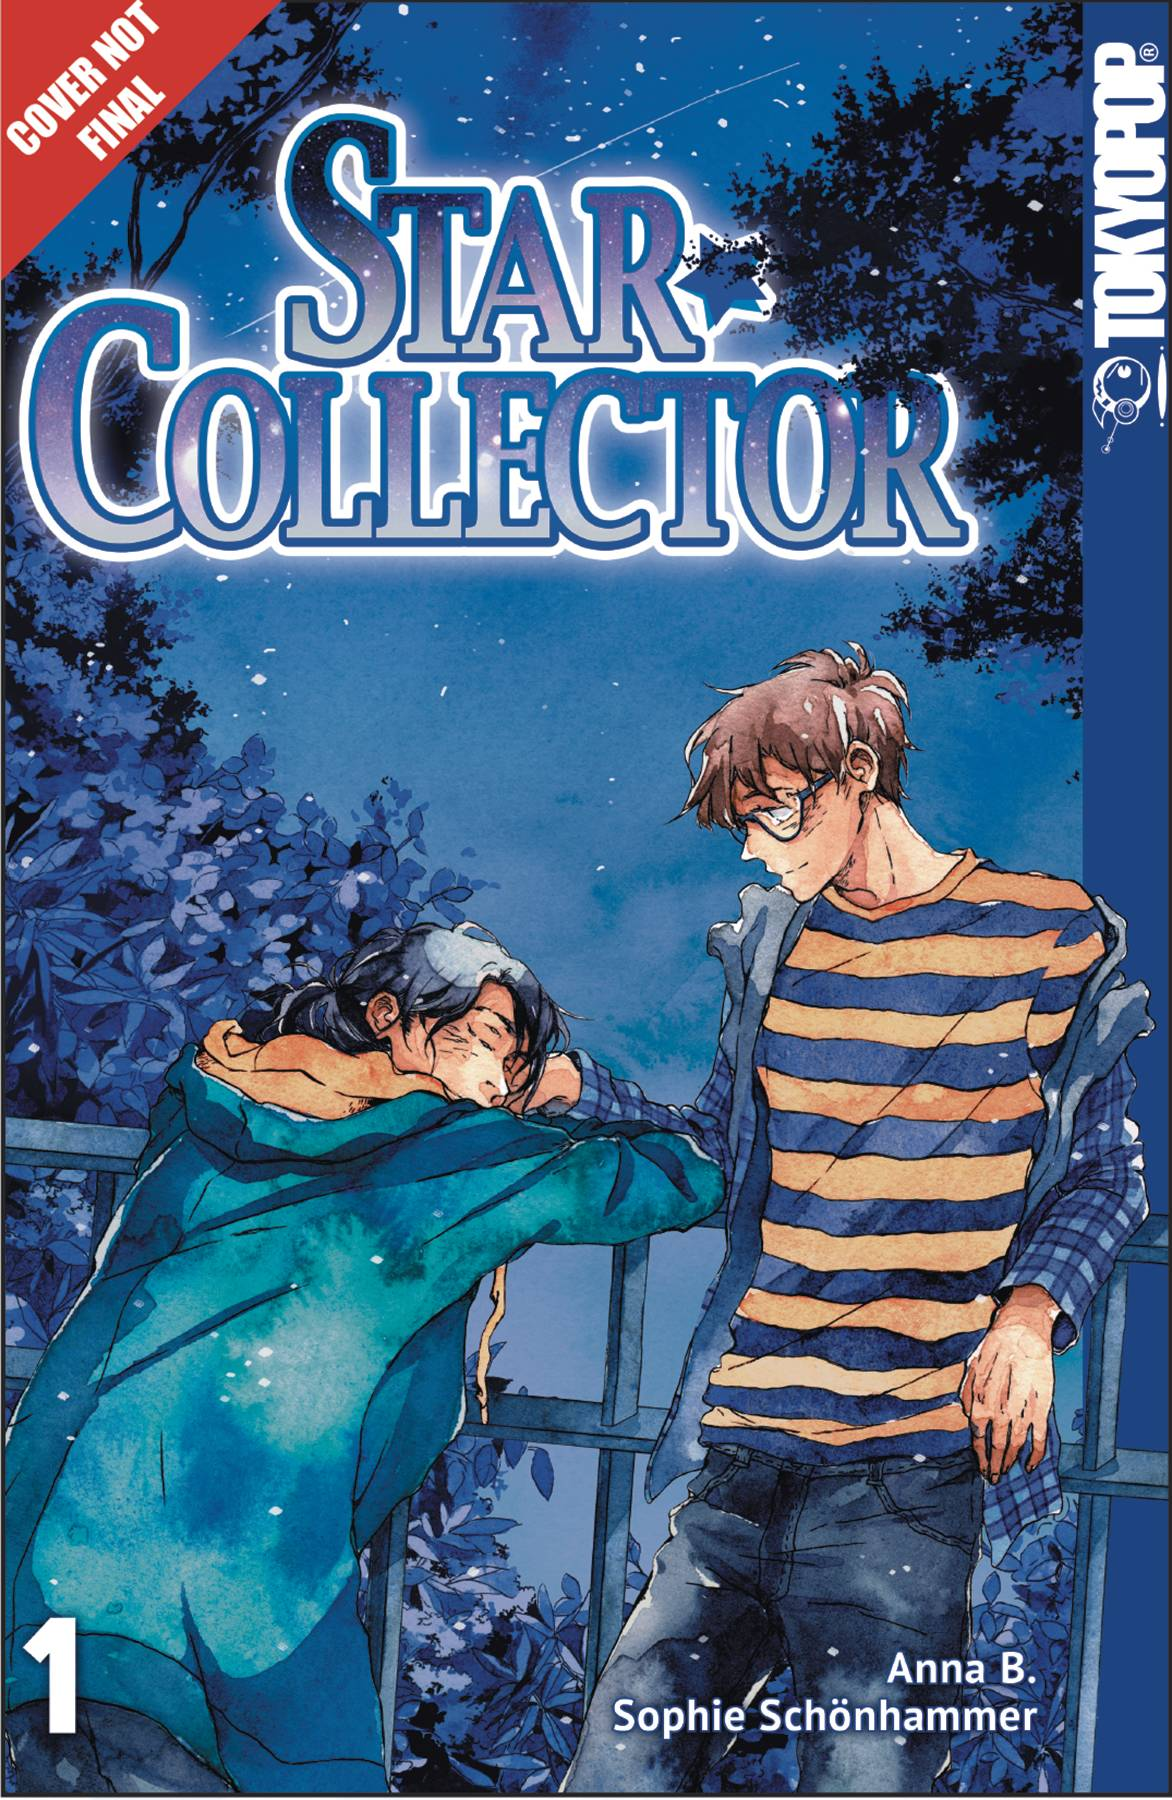 STAR COLLECTOR MANGA GN VOL 01